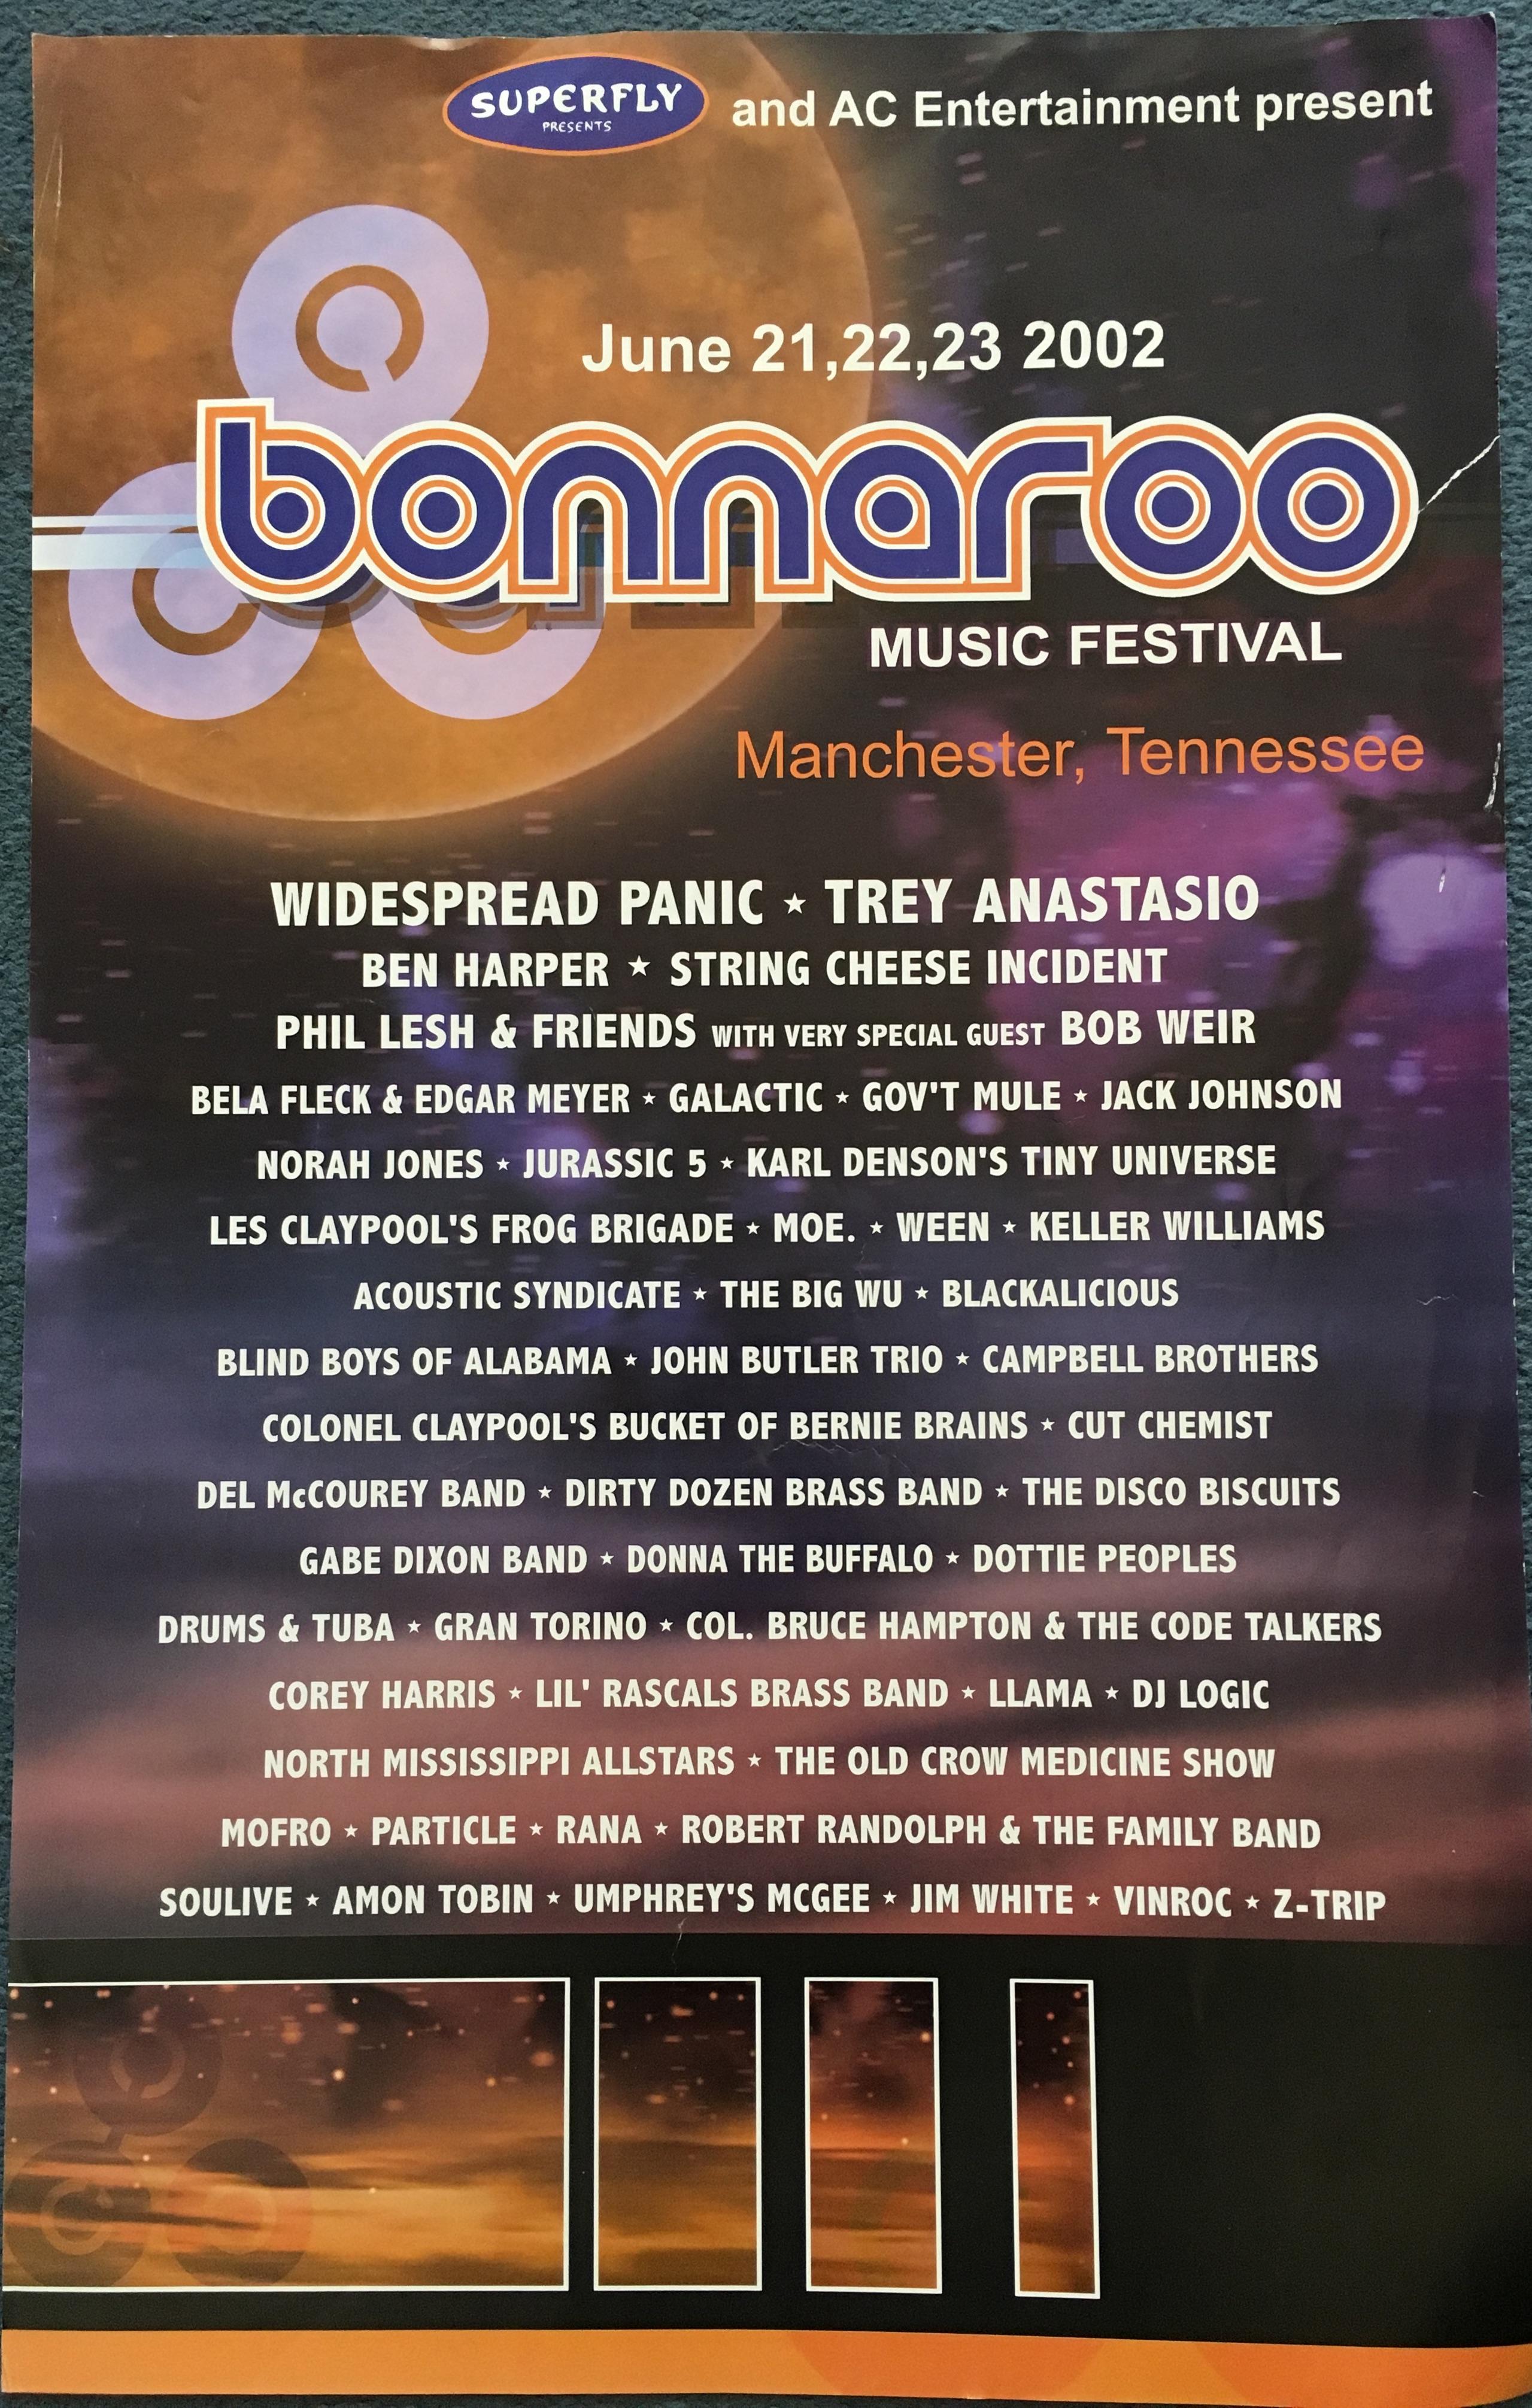 Bonnaroo 2002 Lineup Poster